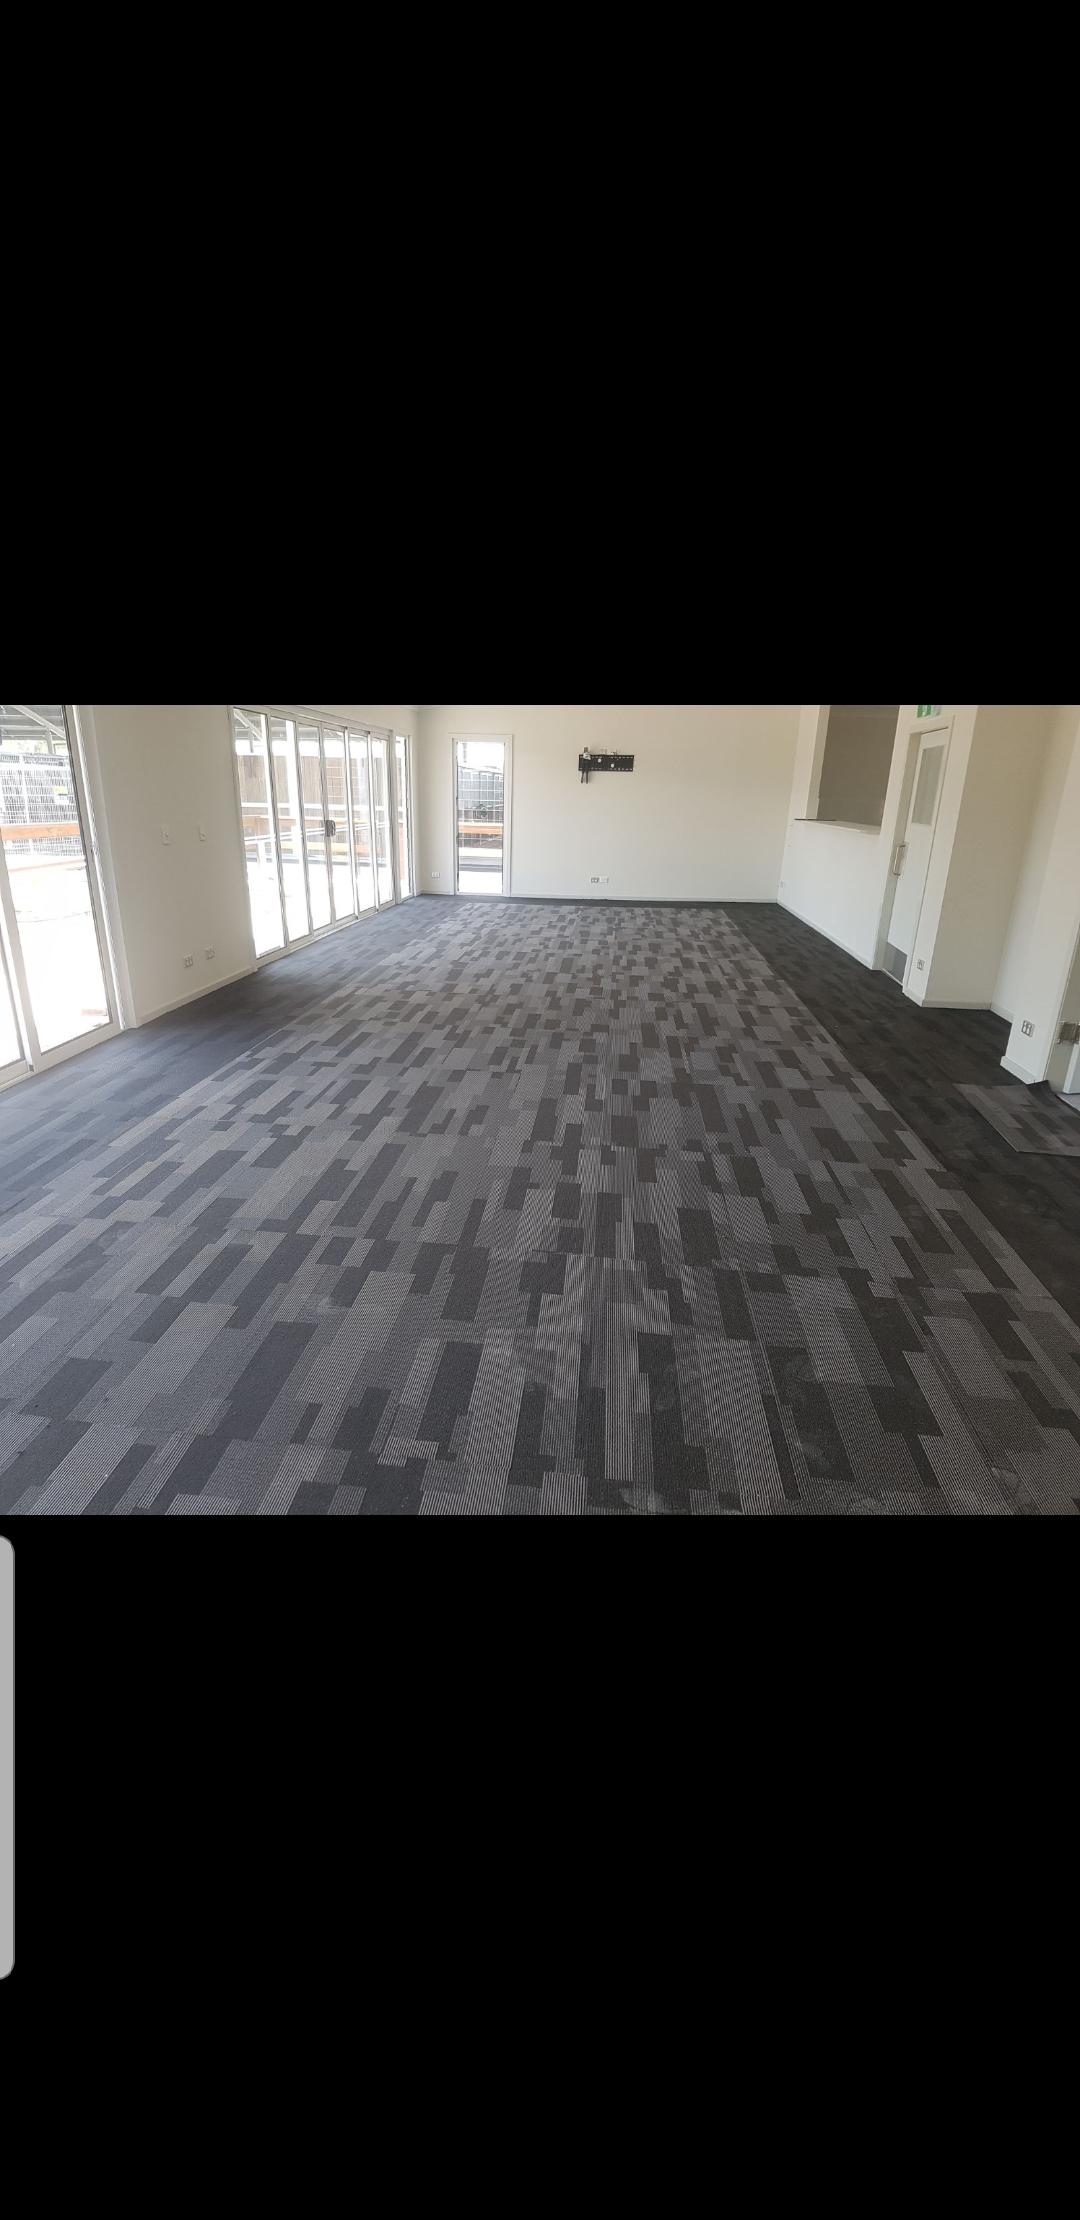 Carpet Tiles - Plank